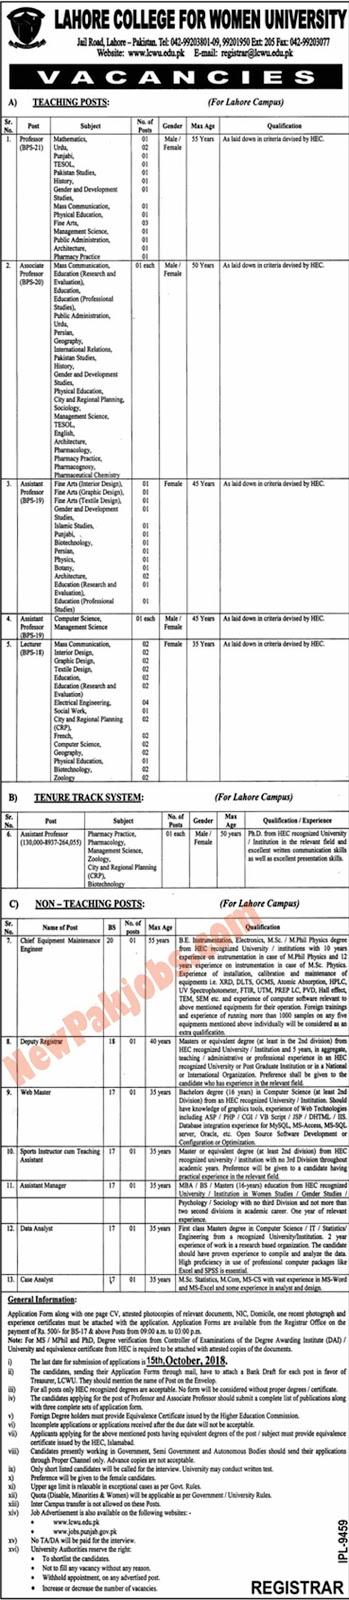 New Govt Jobs in Lahore College For Women University